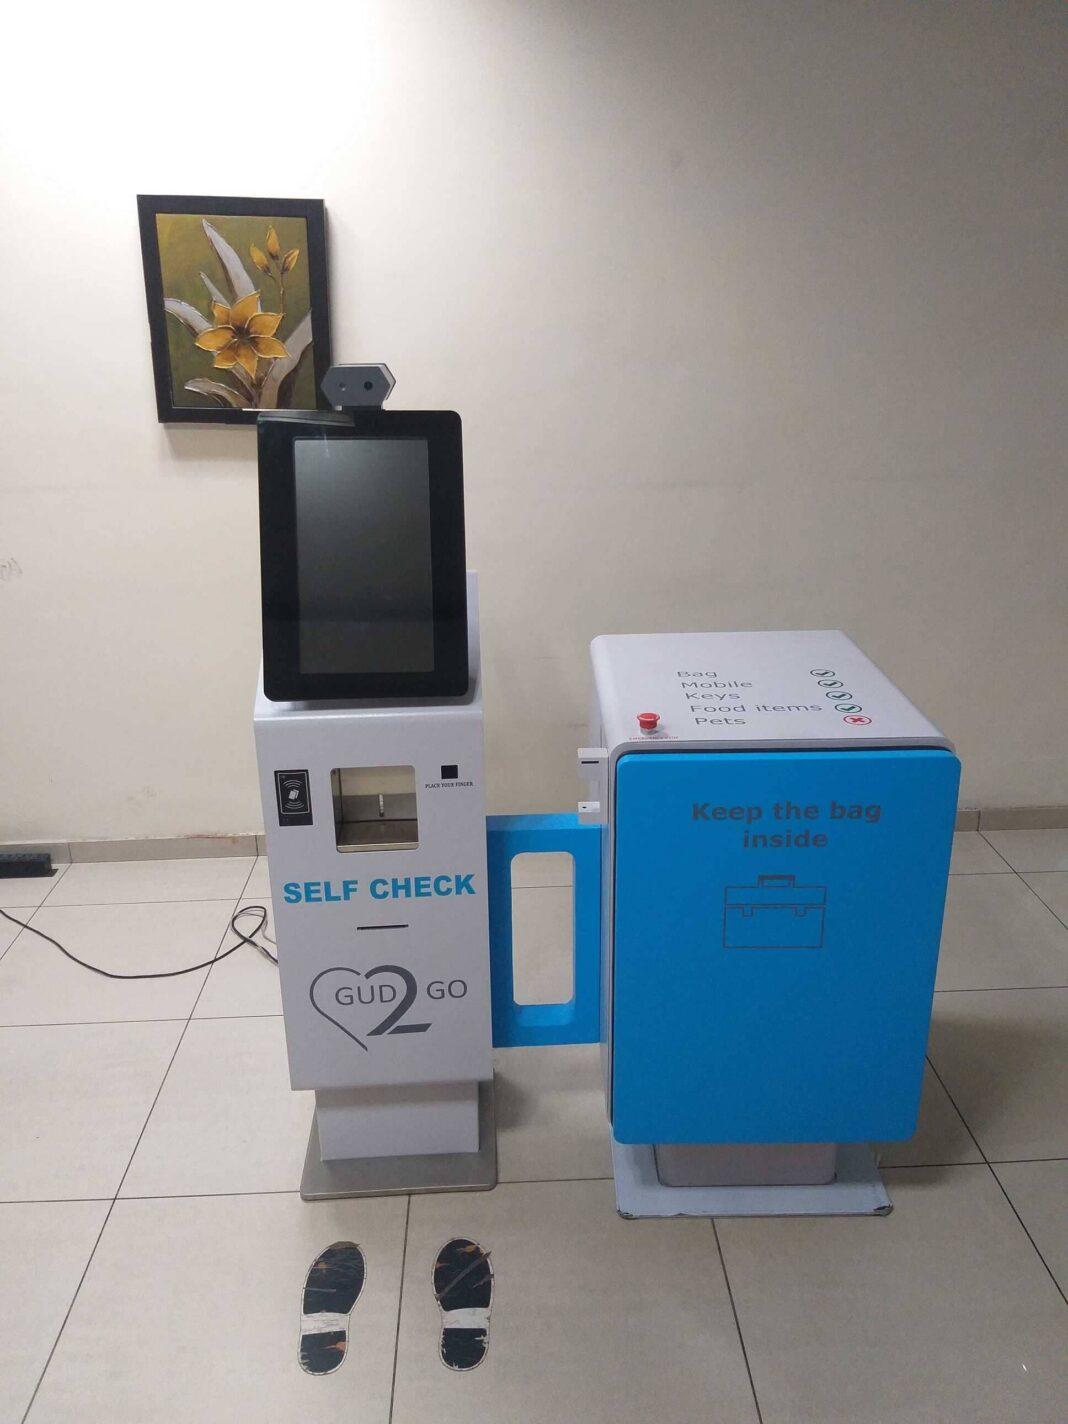 IIT Guwahati develops a first-of-its-kind Self Check Kiosk